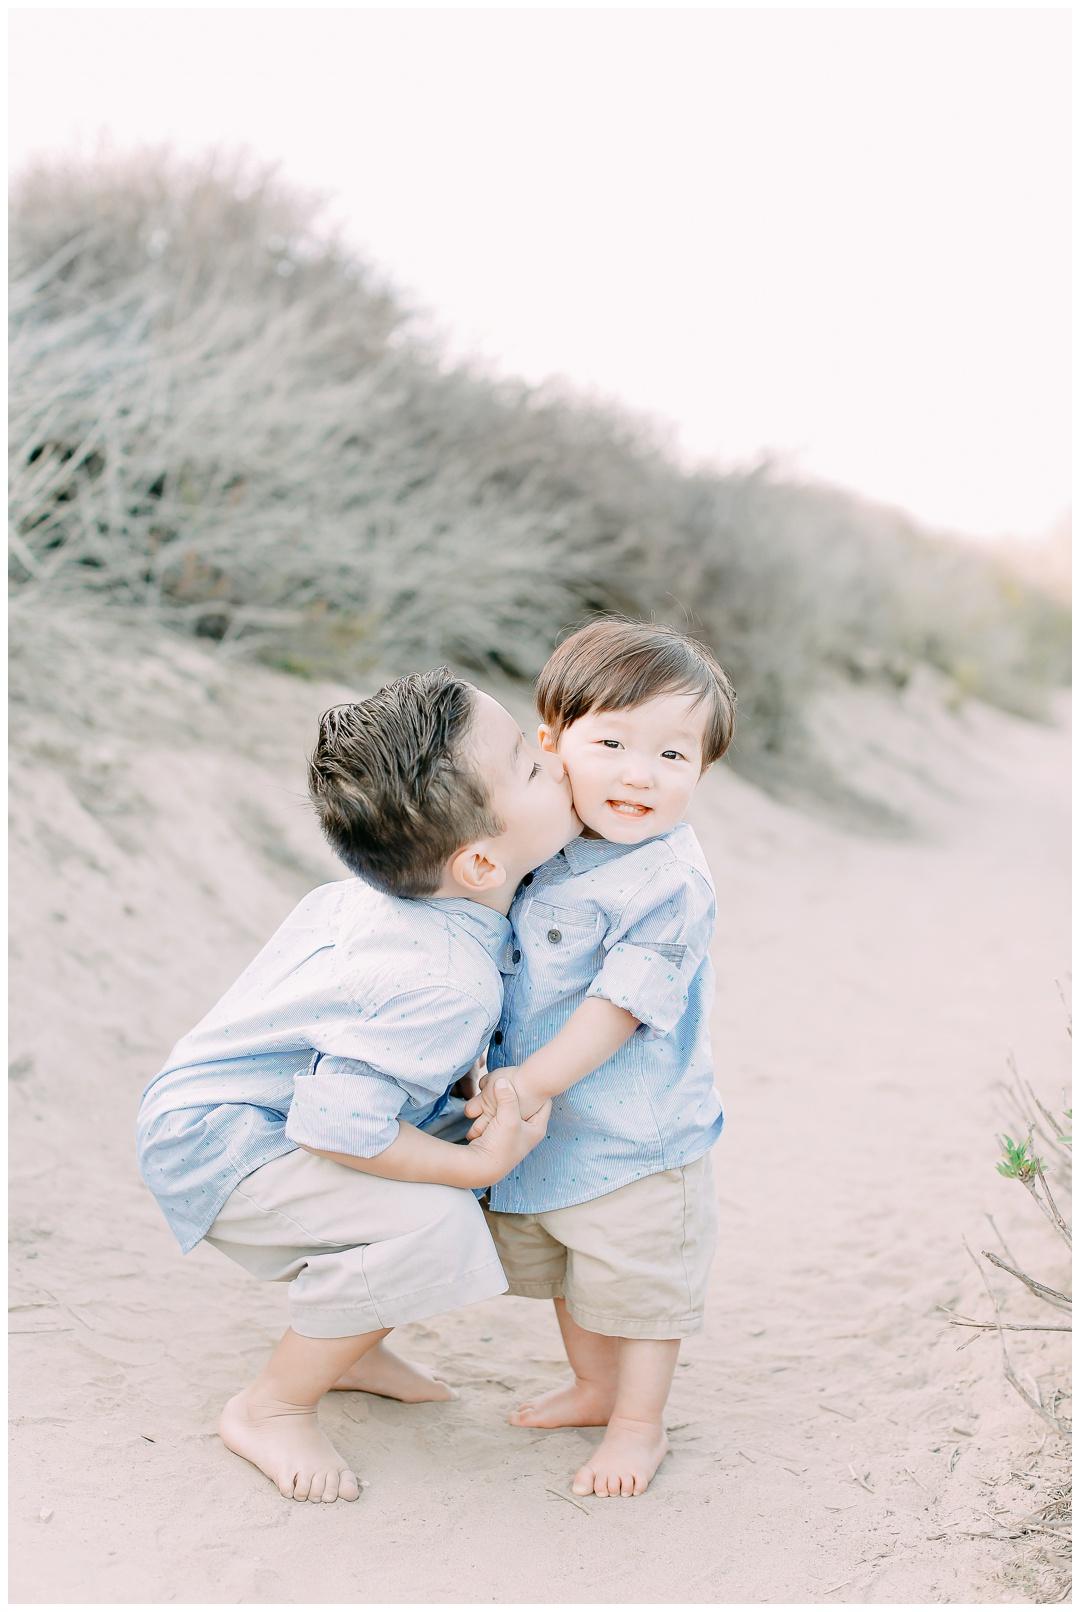 Newport_Beach_Maternity_Photographer_Orange_County_Maternity_Photography_Cori_Kleckner_Photography_Orange_County_Family_Photographer_Beach_Maternity_Session_1109.jpg